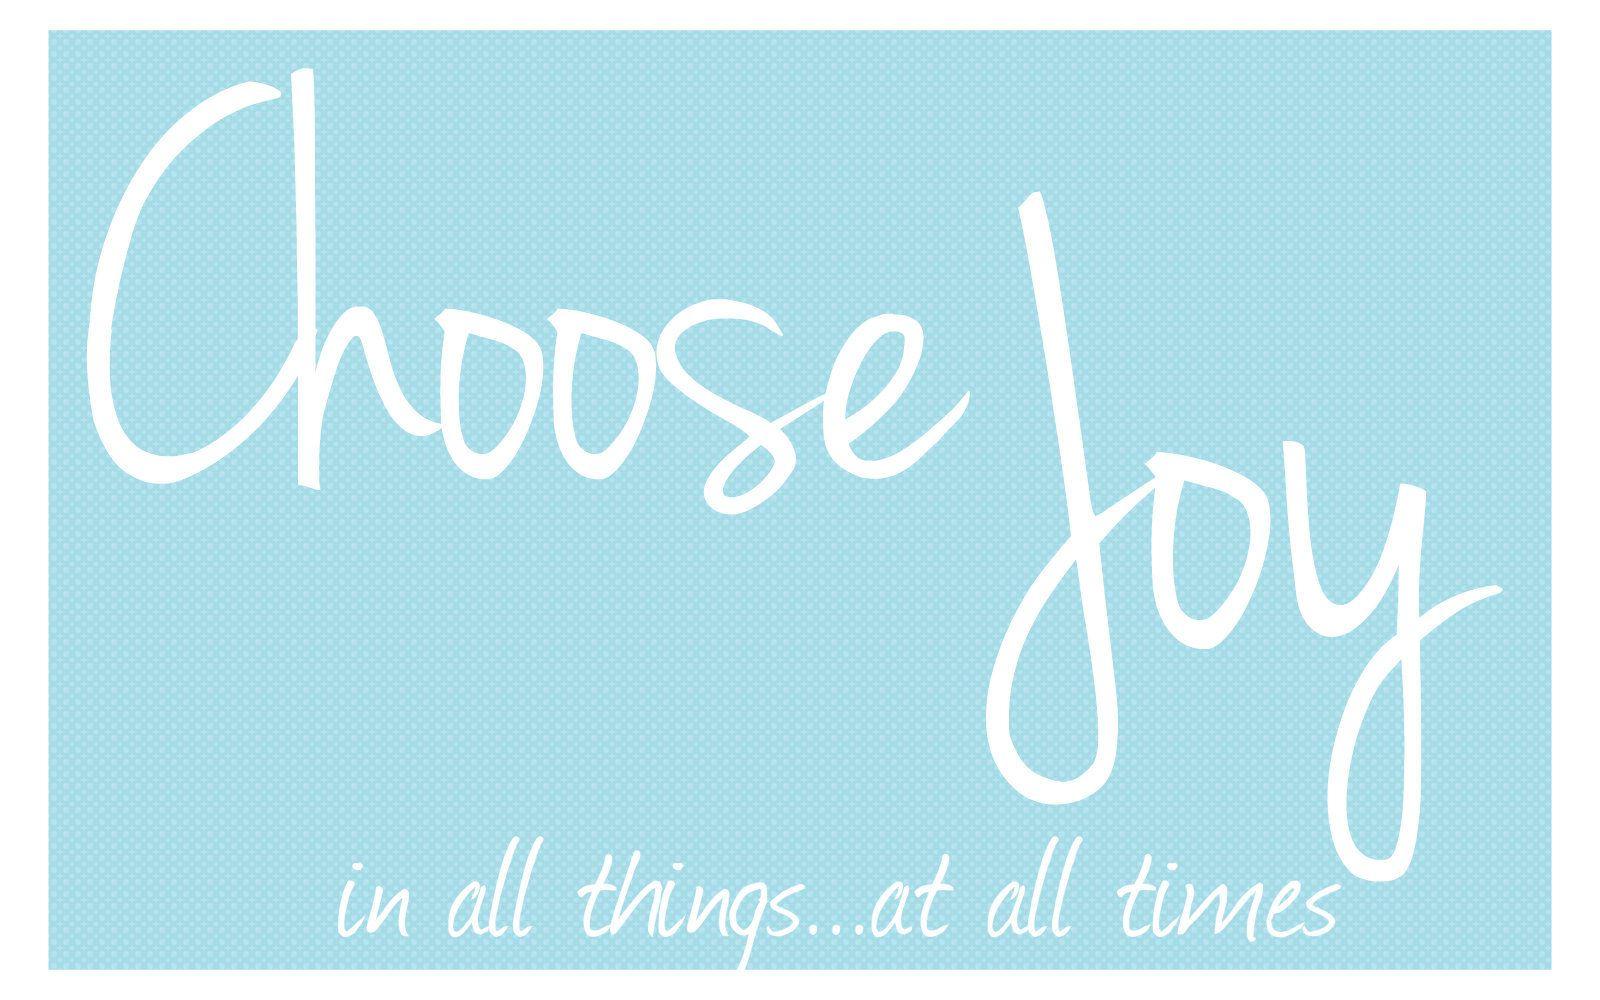 Sparkling Choose Printable Choose Printable Home Pinterest Choose Bible Joy Bible Verse S Joy Bible Verses Images inspiration Joy Bible Verses